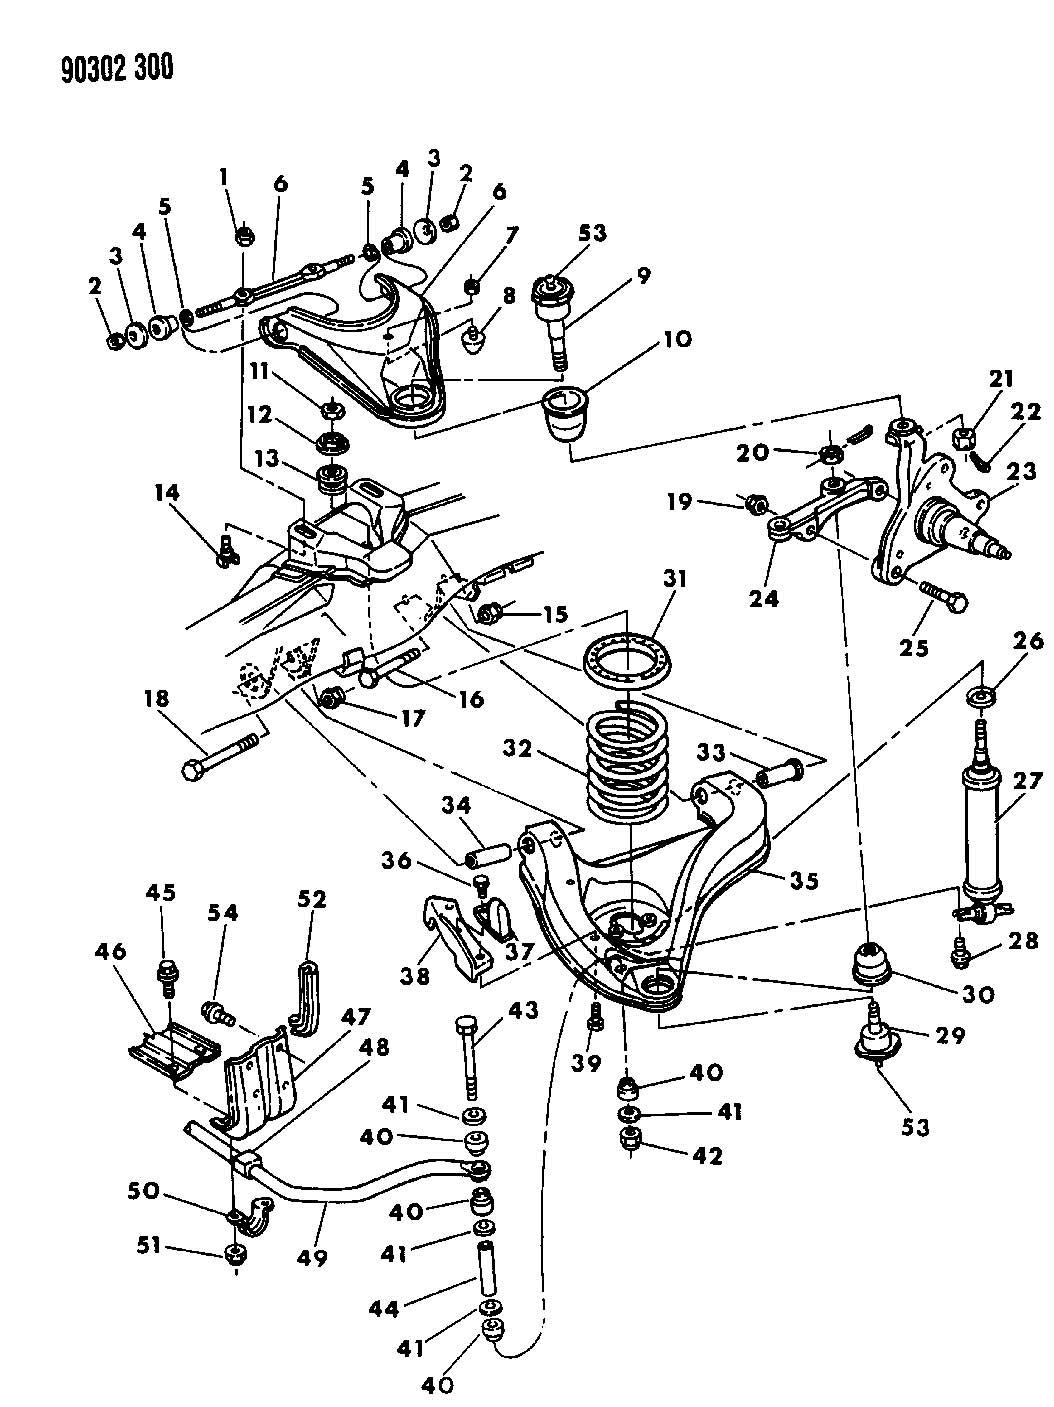 Chrysler Aspen Nut Mounting Upper Control Arm Hex